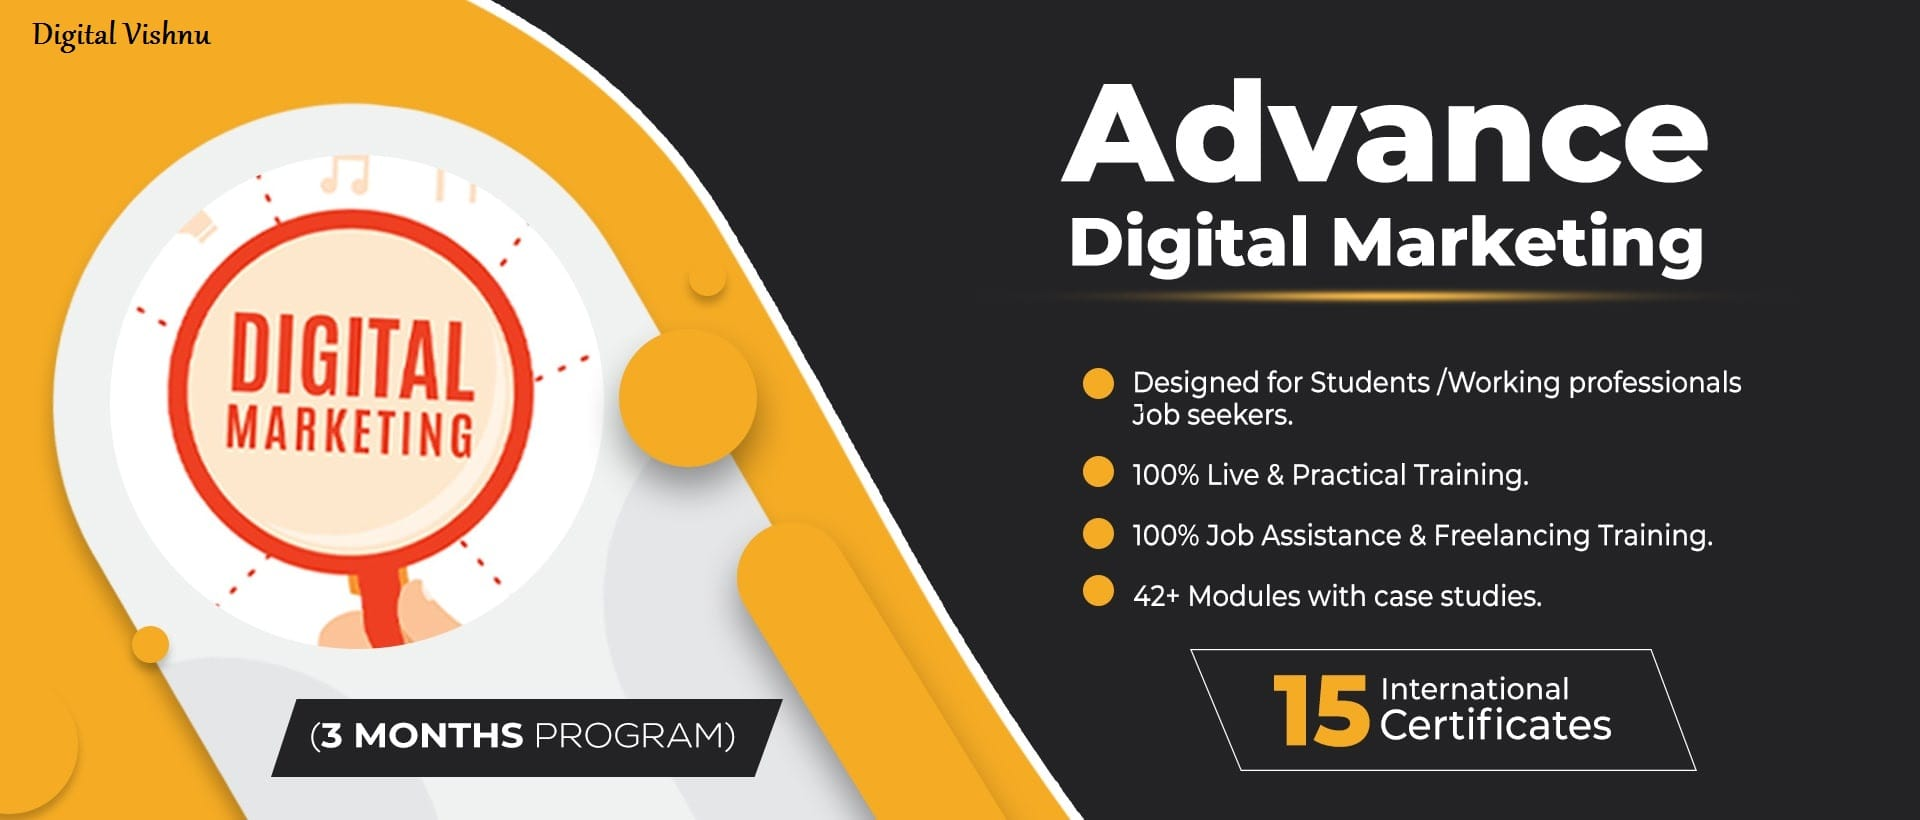 Advanced Digital Marketing Course Training in Theni Digital Vishnu